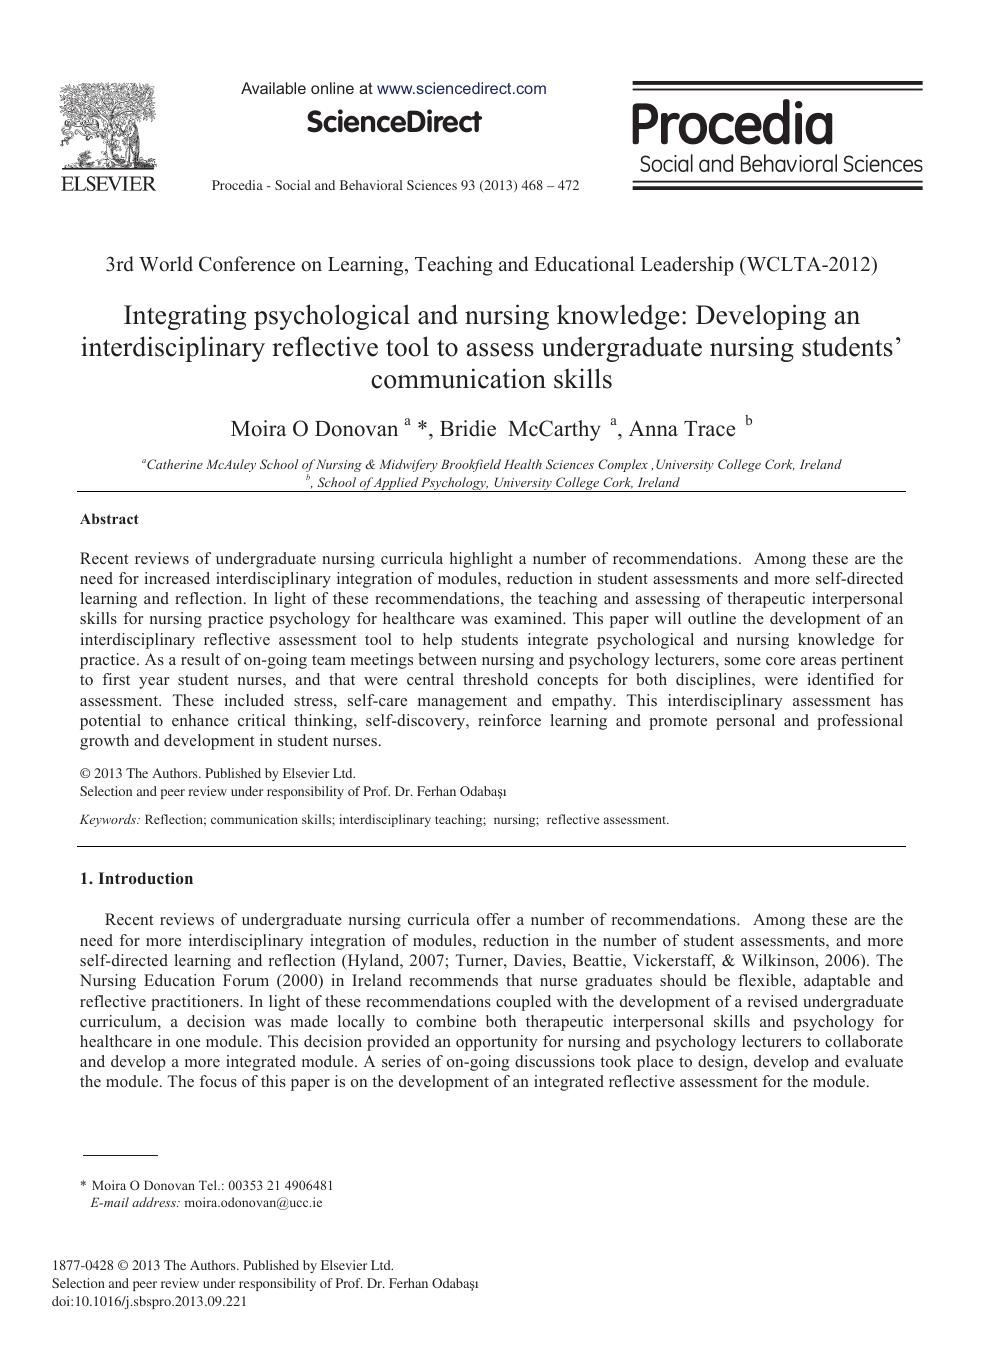 Integrating Psychological and Nursing Knowledge: Developing